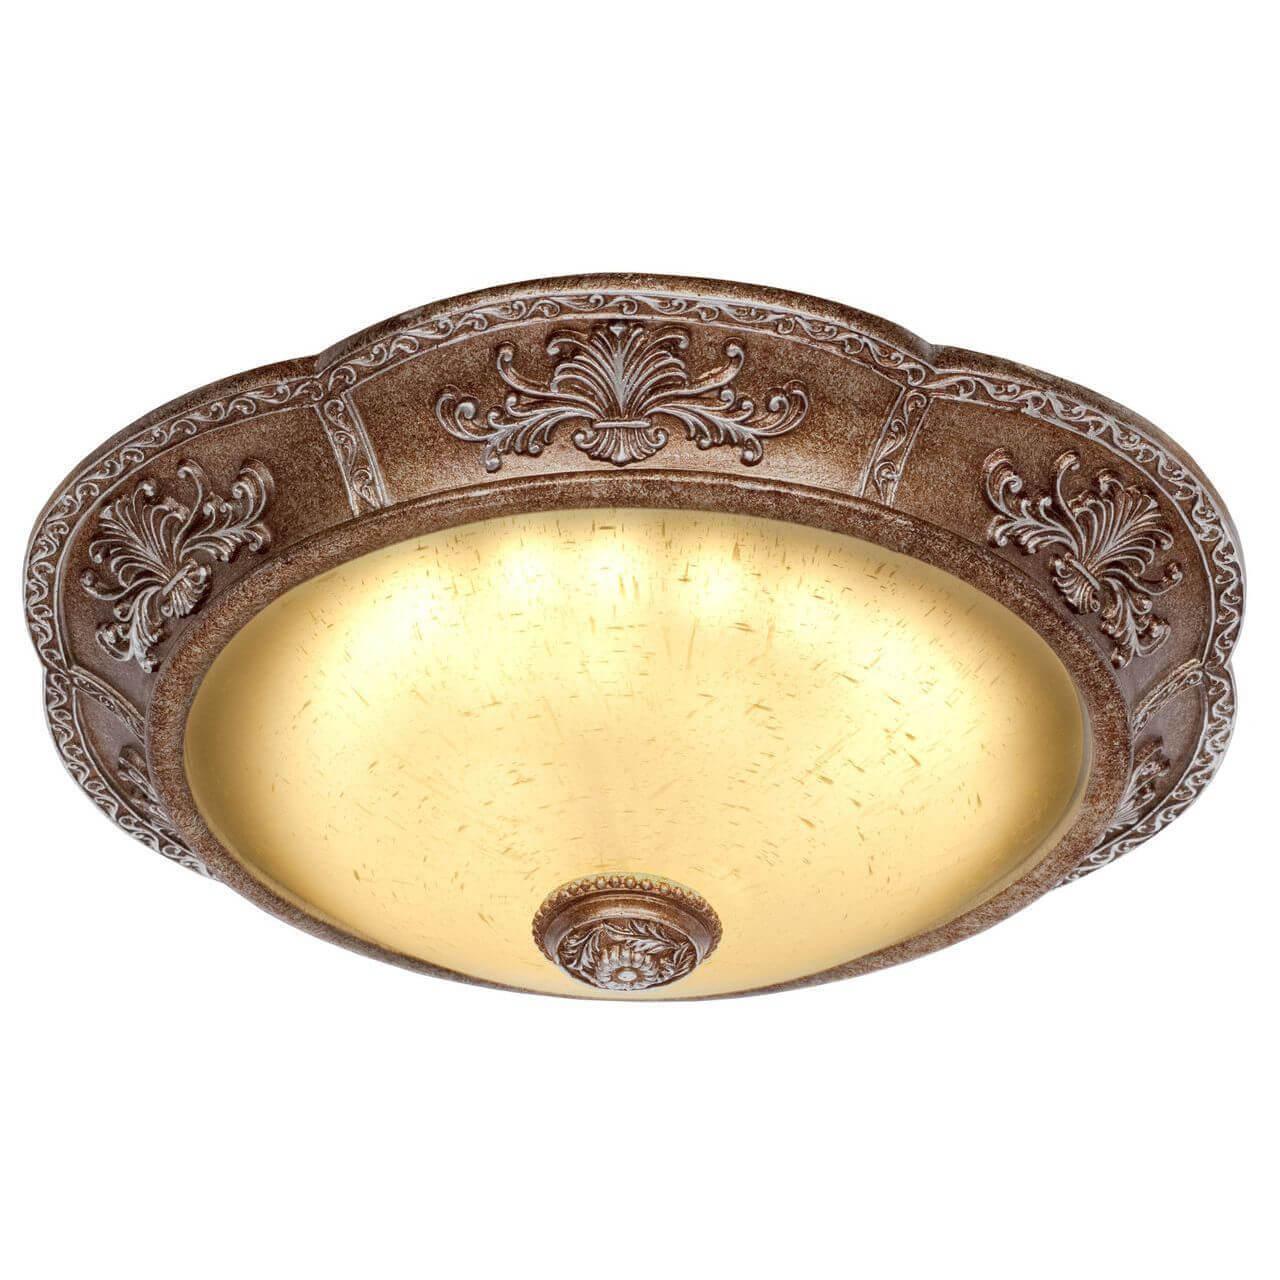 Светильник Silver Light 830.34.7 Louvre Brown Beige настенный светодиодный светильник silver light louvre 844 36 7